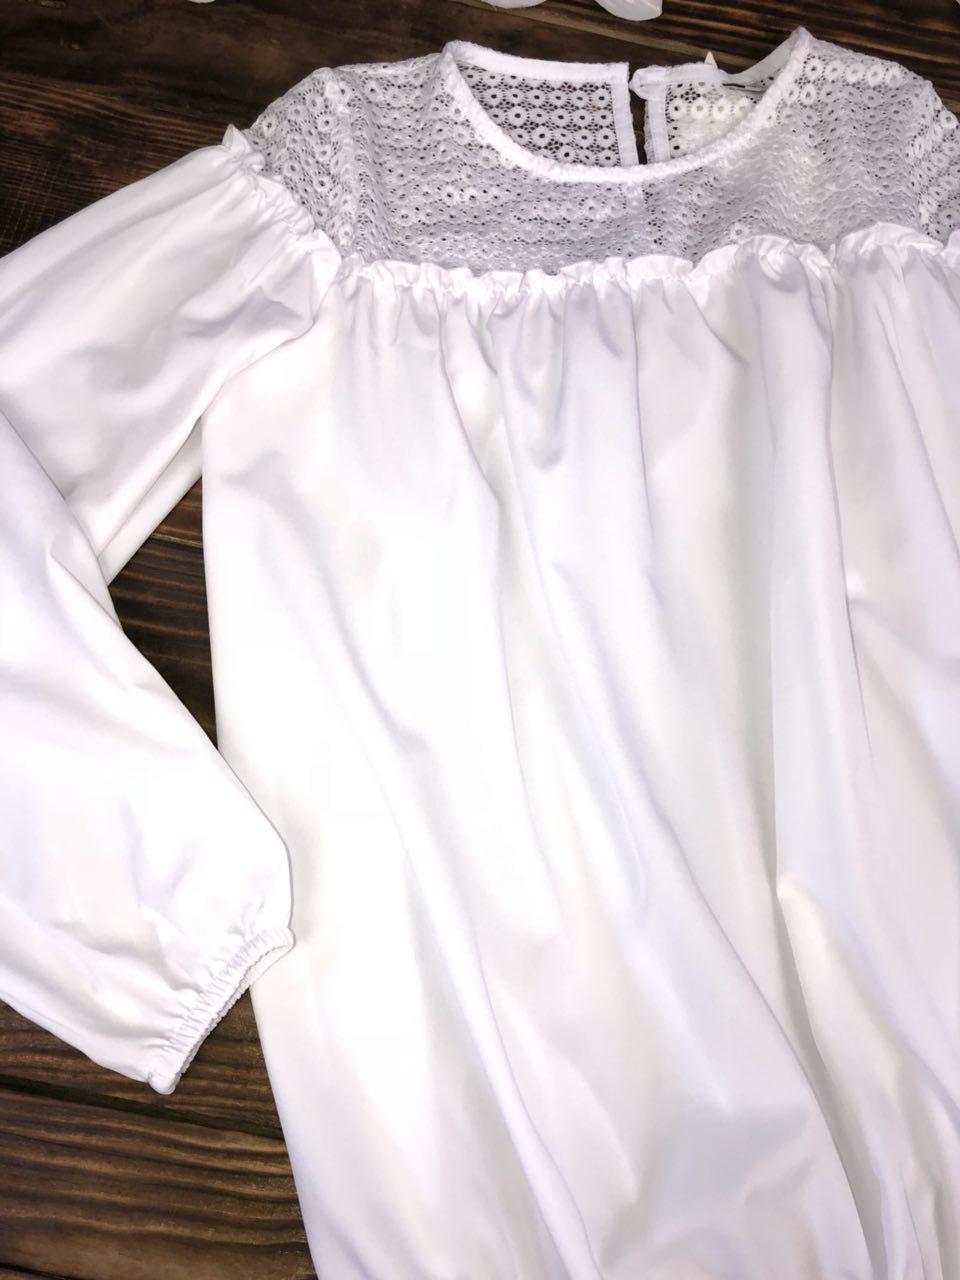 a94ce0a4faa Блузка белая с кружевом  продажа